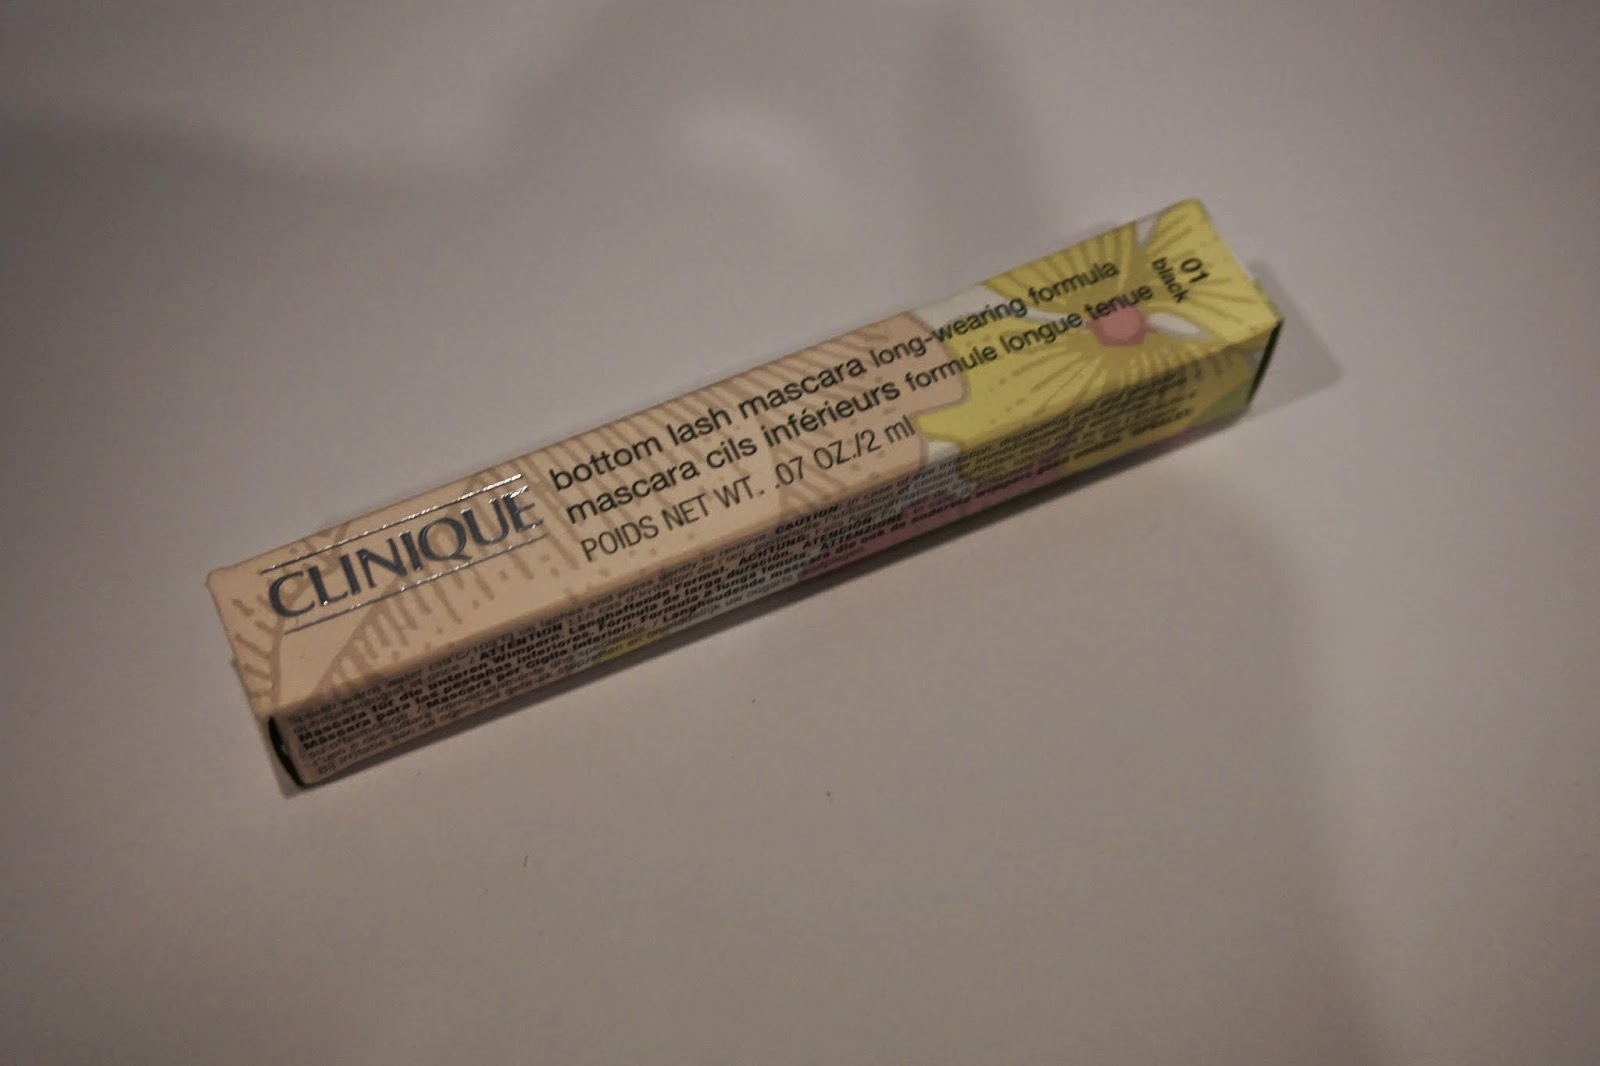 Sephora Haul and mini reviews - Clinque Bottom Lash Mascara - Dusty Foxes Beauty Blog